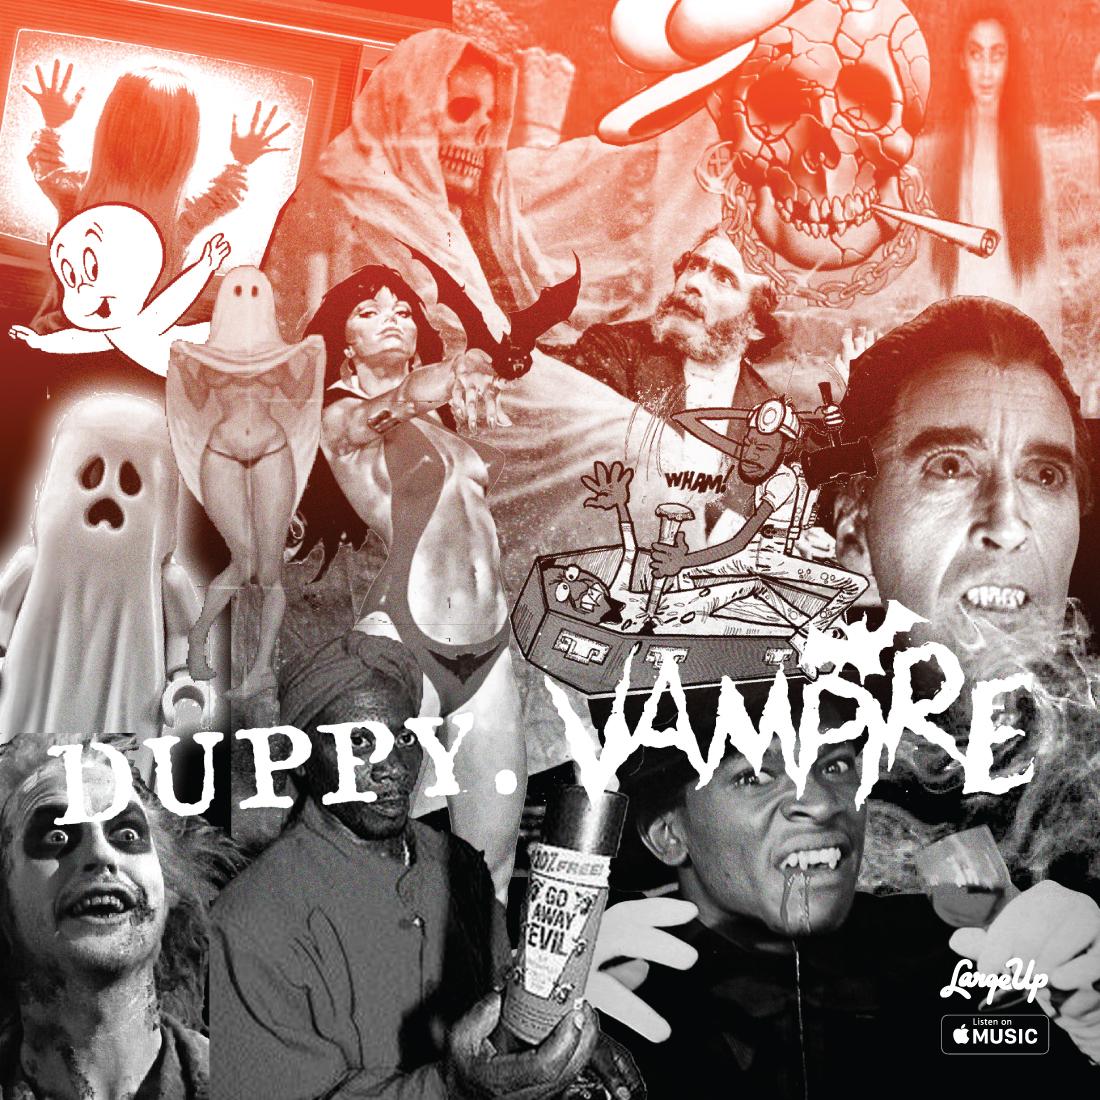 duppy-vampire-haunted-reggae-playlist